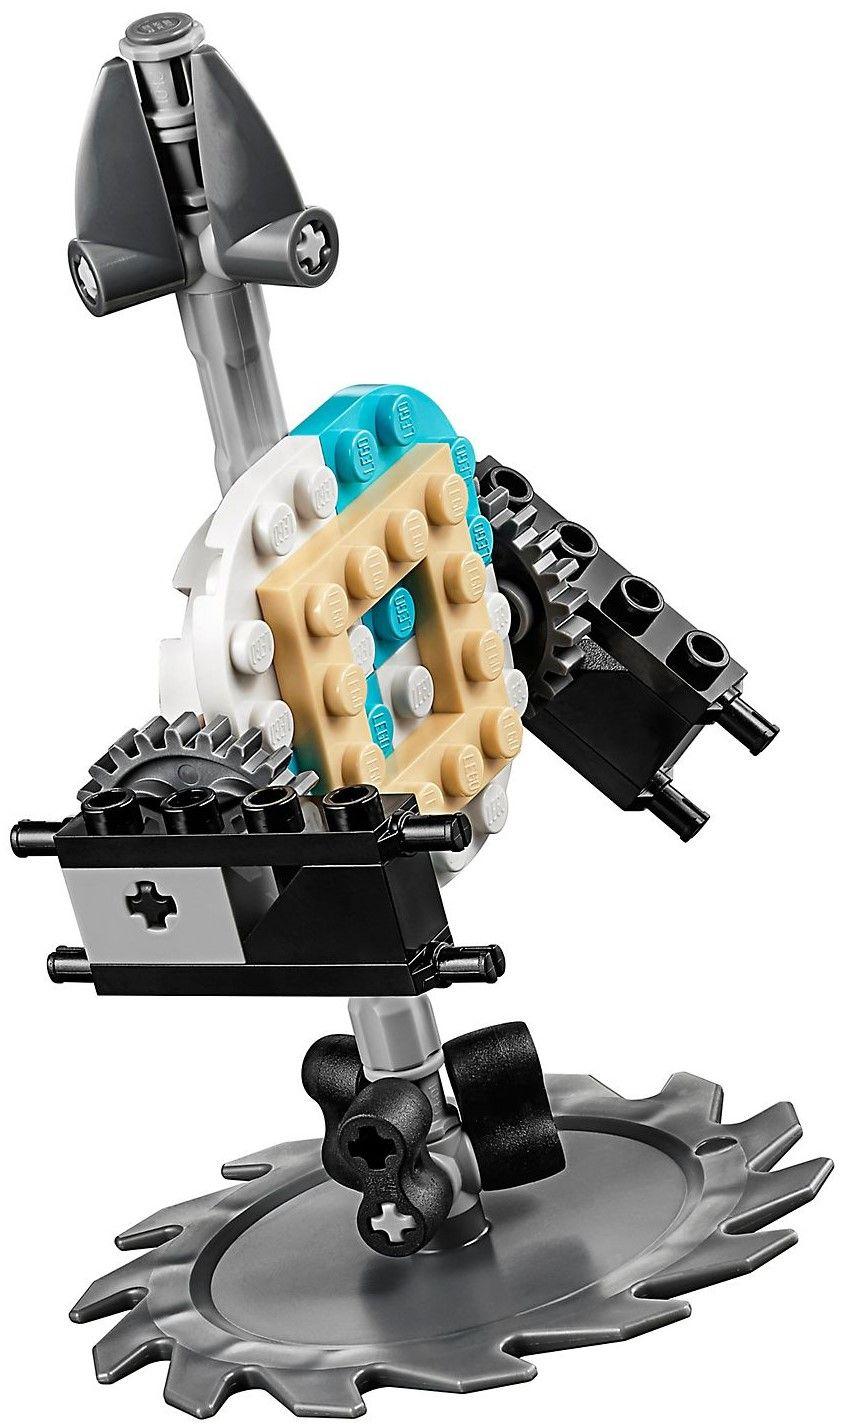 Конструктор Lego Star Wars - Droid Commander (75253) - 9